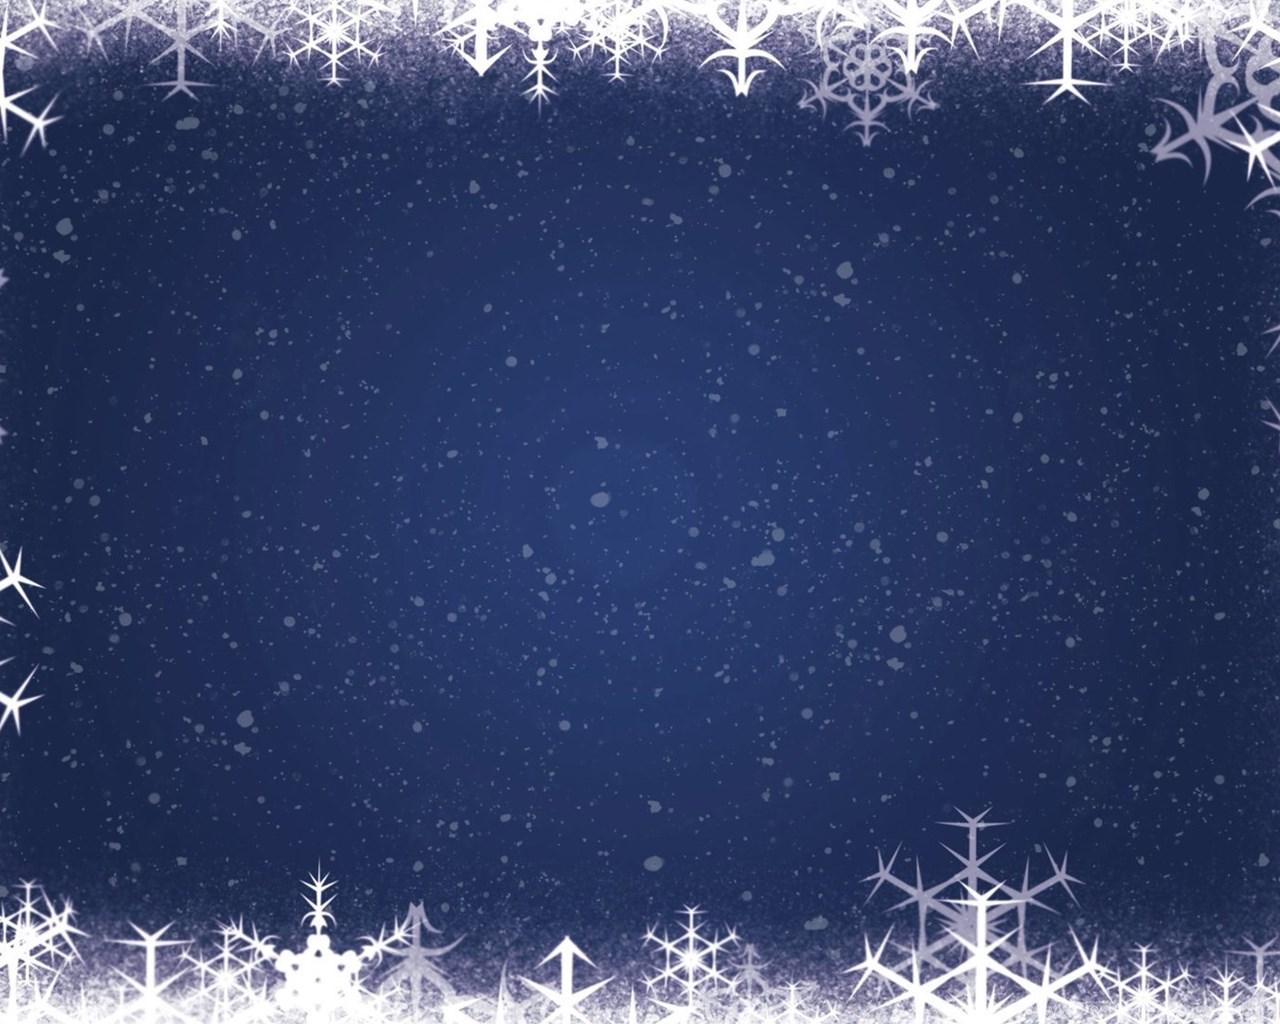 Nyewall download snowflake background desktop wallpapers widescreen voltagebd Gallery